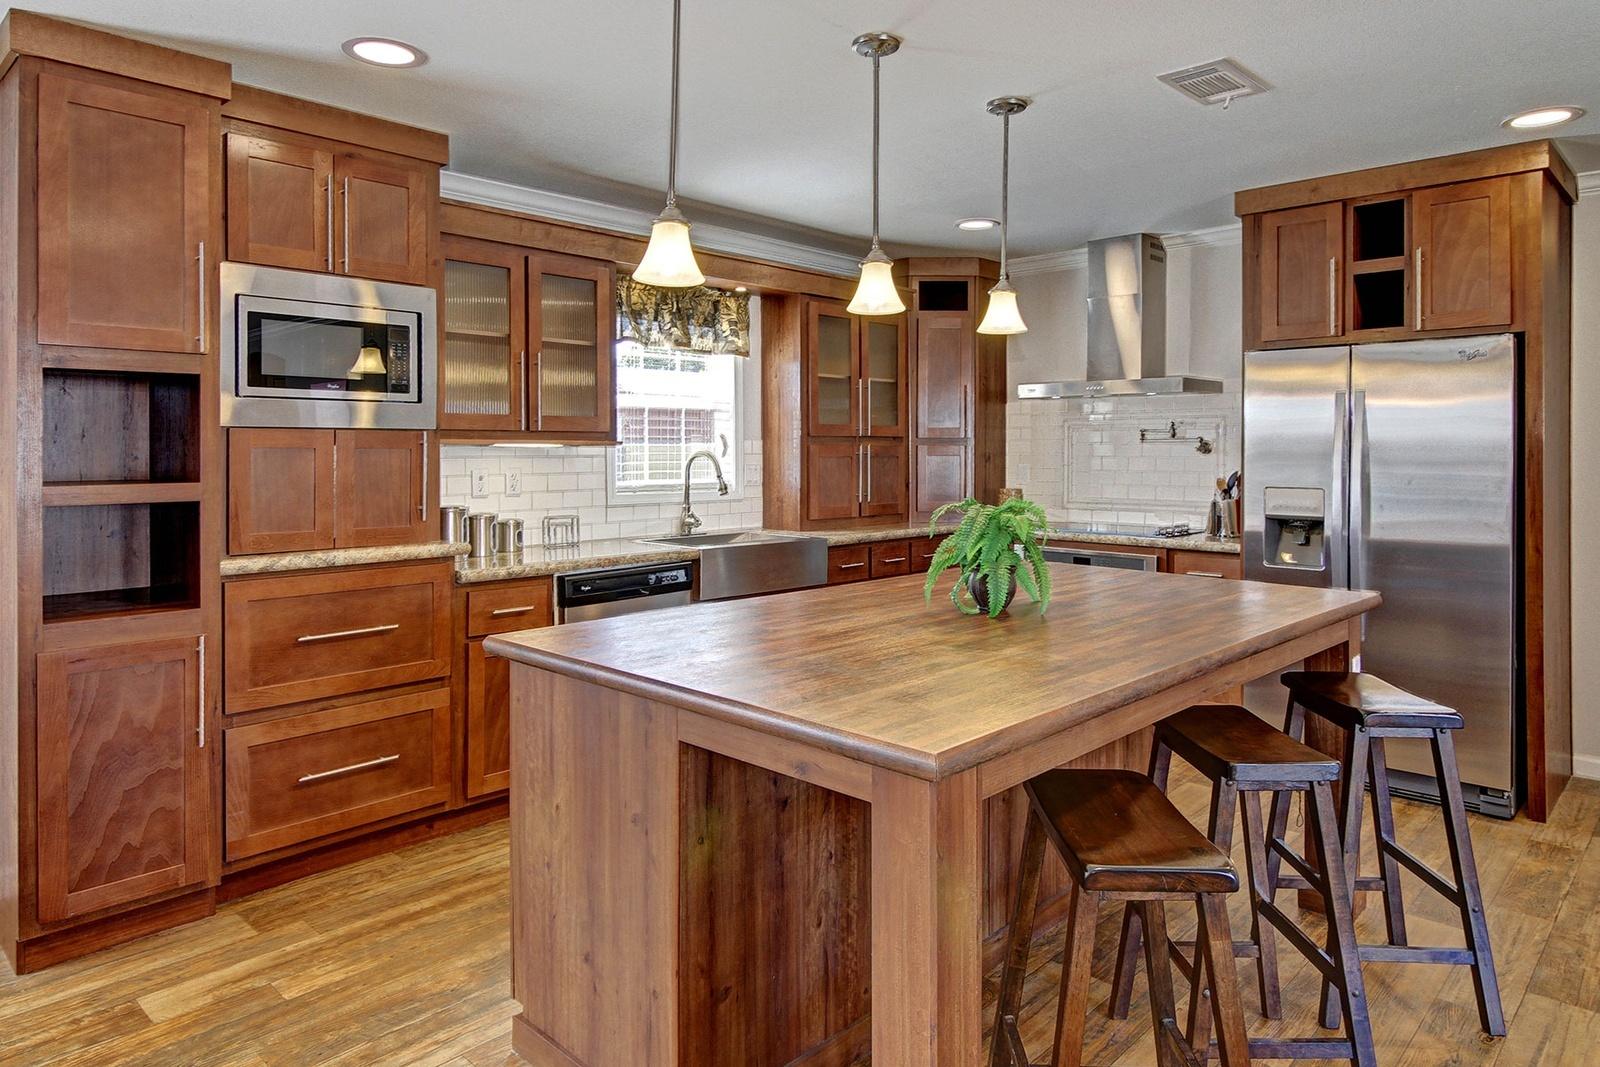 hillcrest-ultimate-kitchen2-1-1600x1067-2.jpg